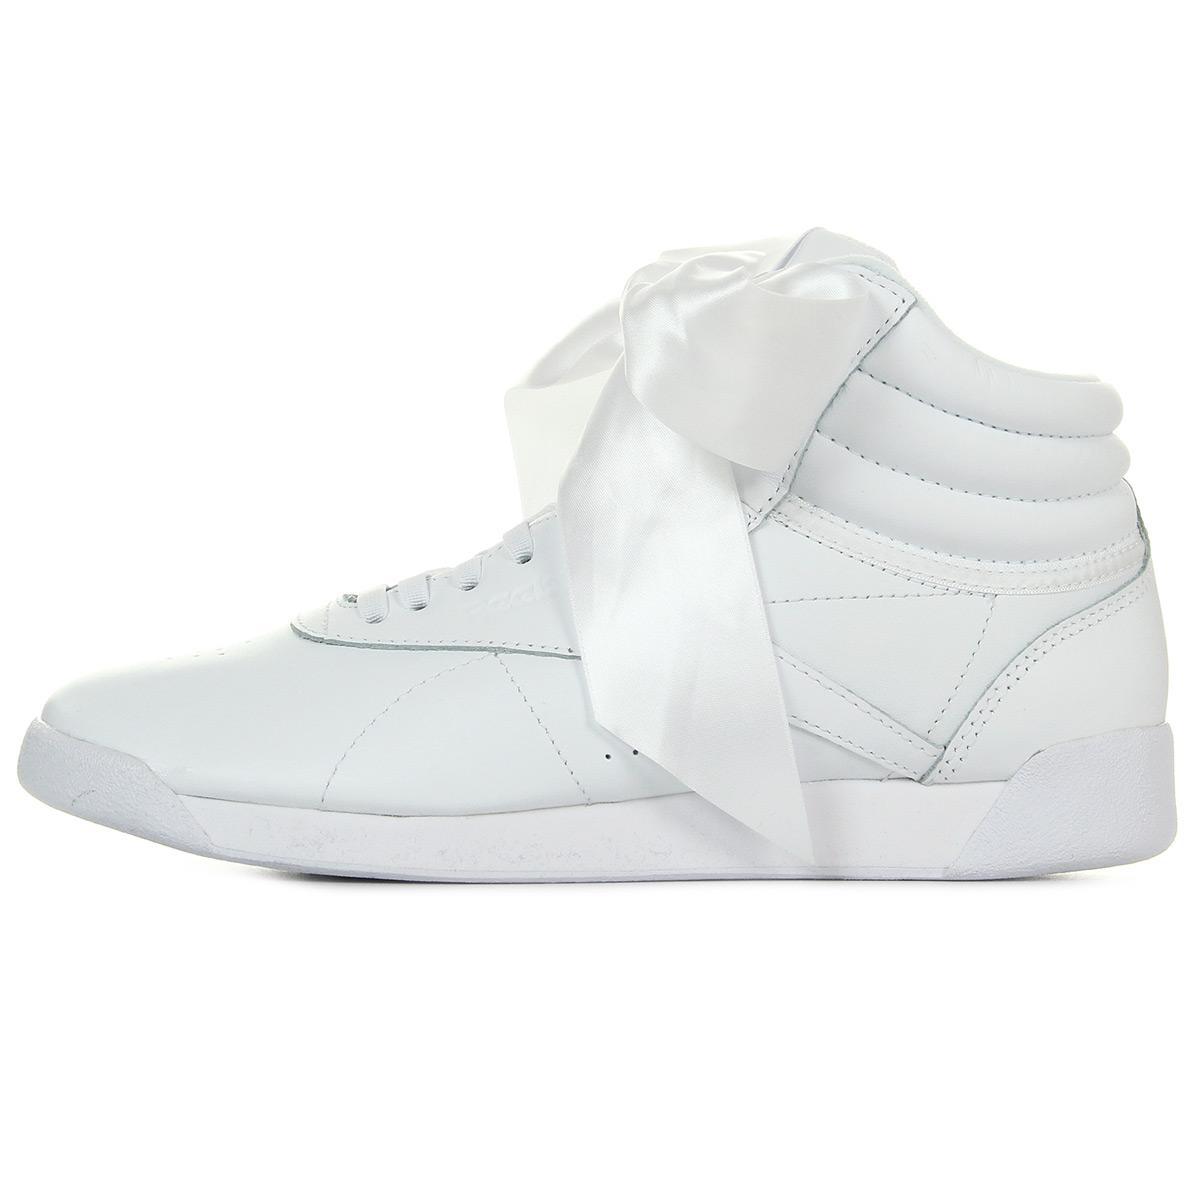 Reebok F/S Hi Satin Bow CM8903, Baskets mode femme